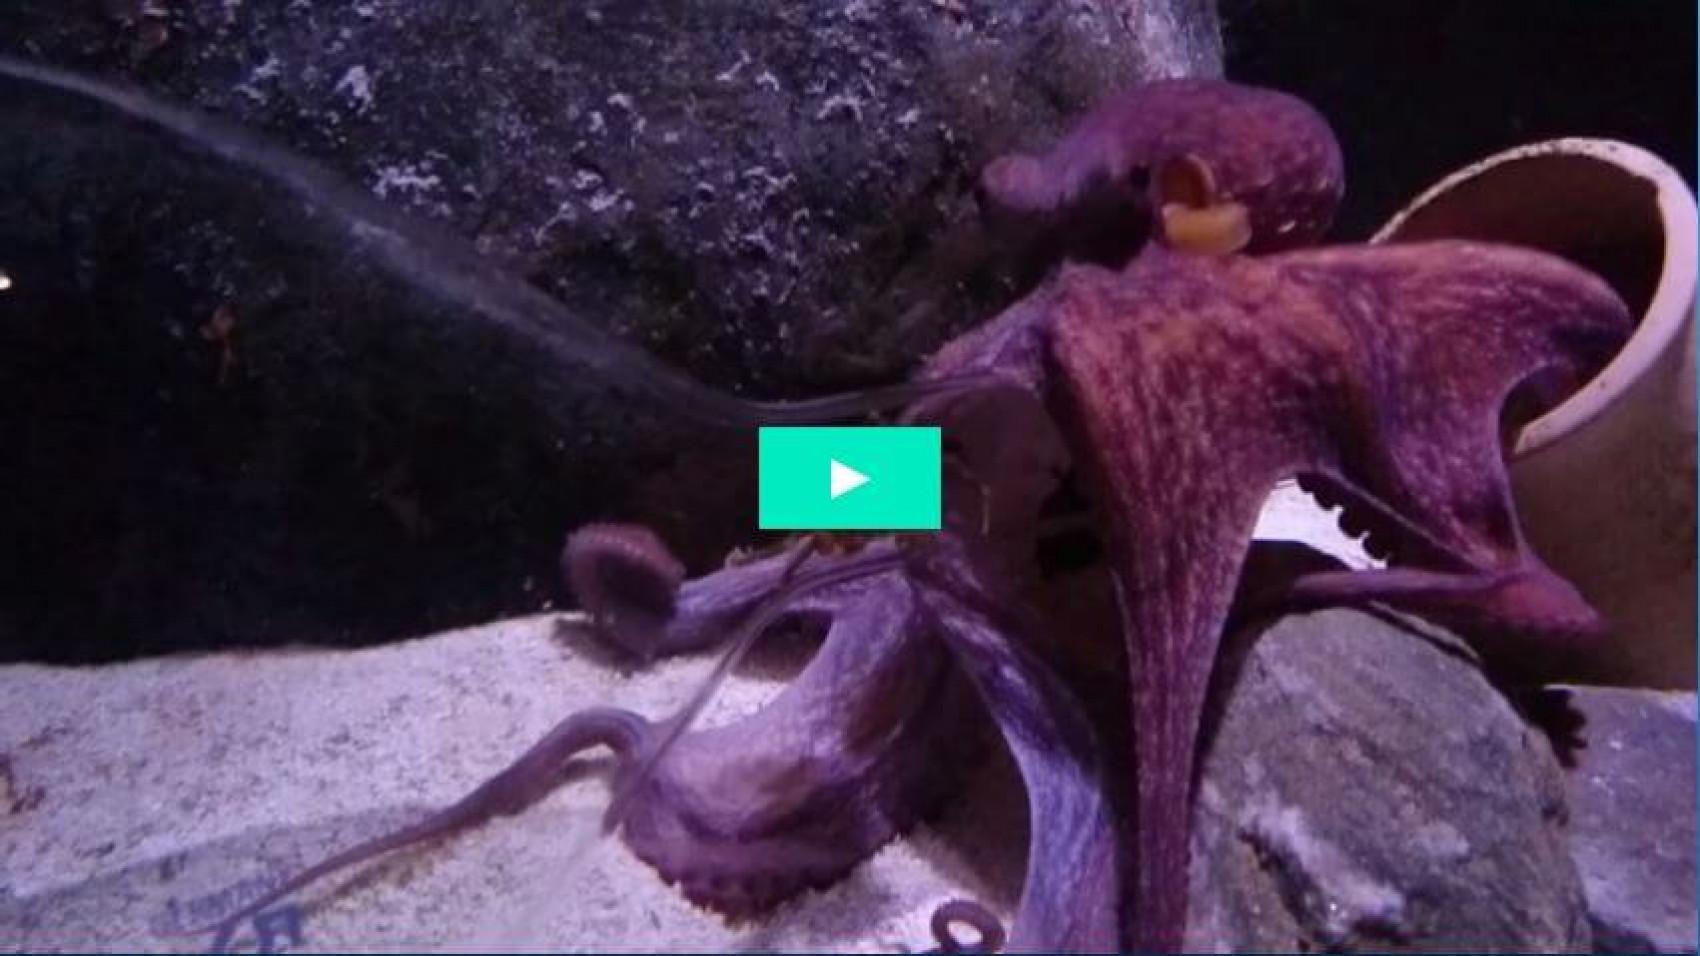 Blæksprutte fanger krabbe i glaskolbe